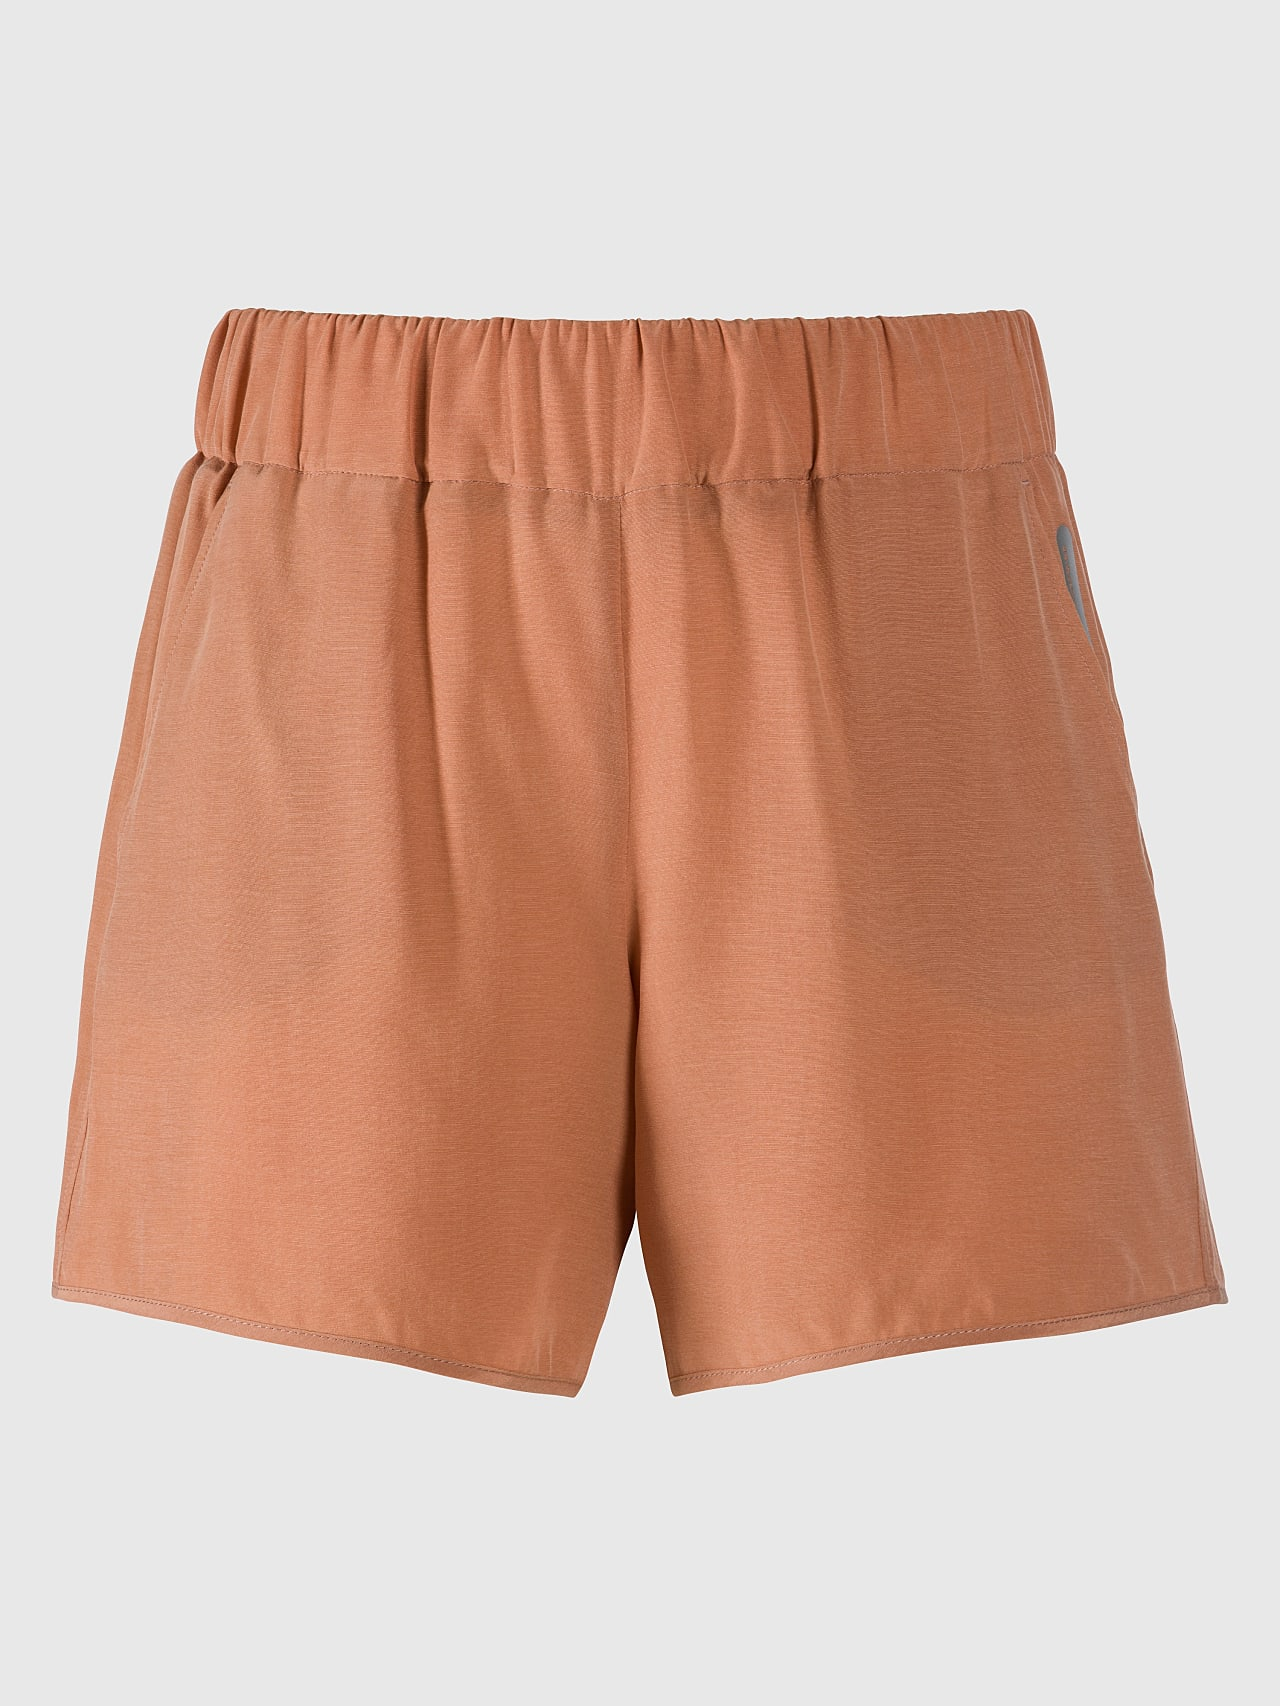 PHORT V1.Y5.01 Relaxed Cupro Shorts rose Back Alpha Tauri